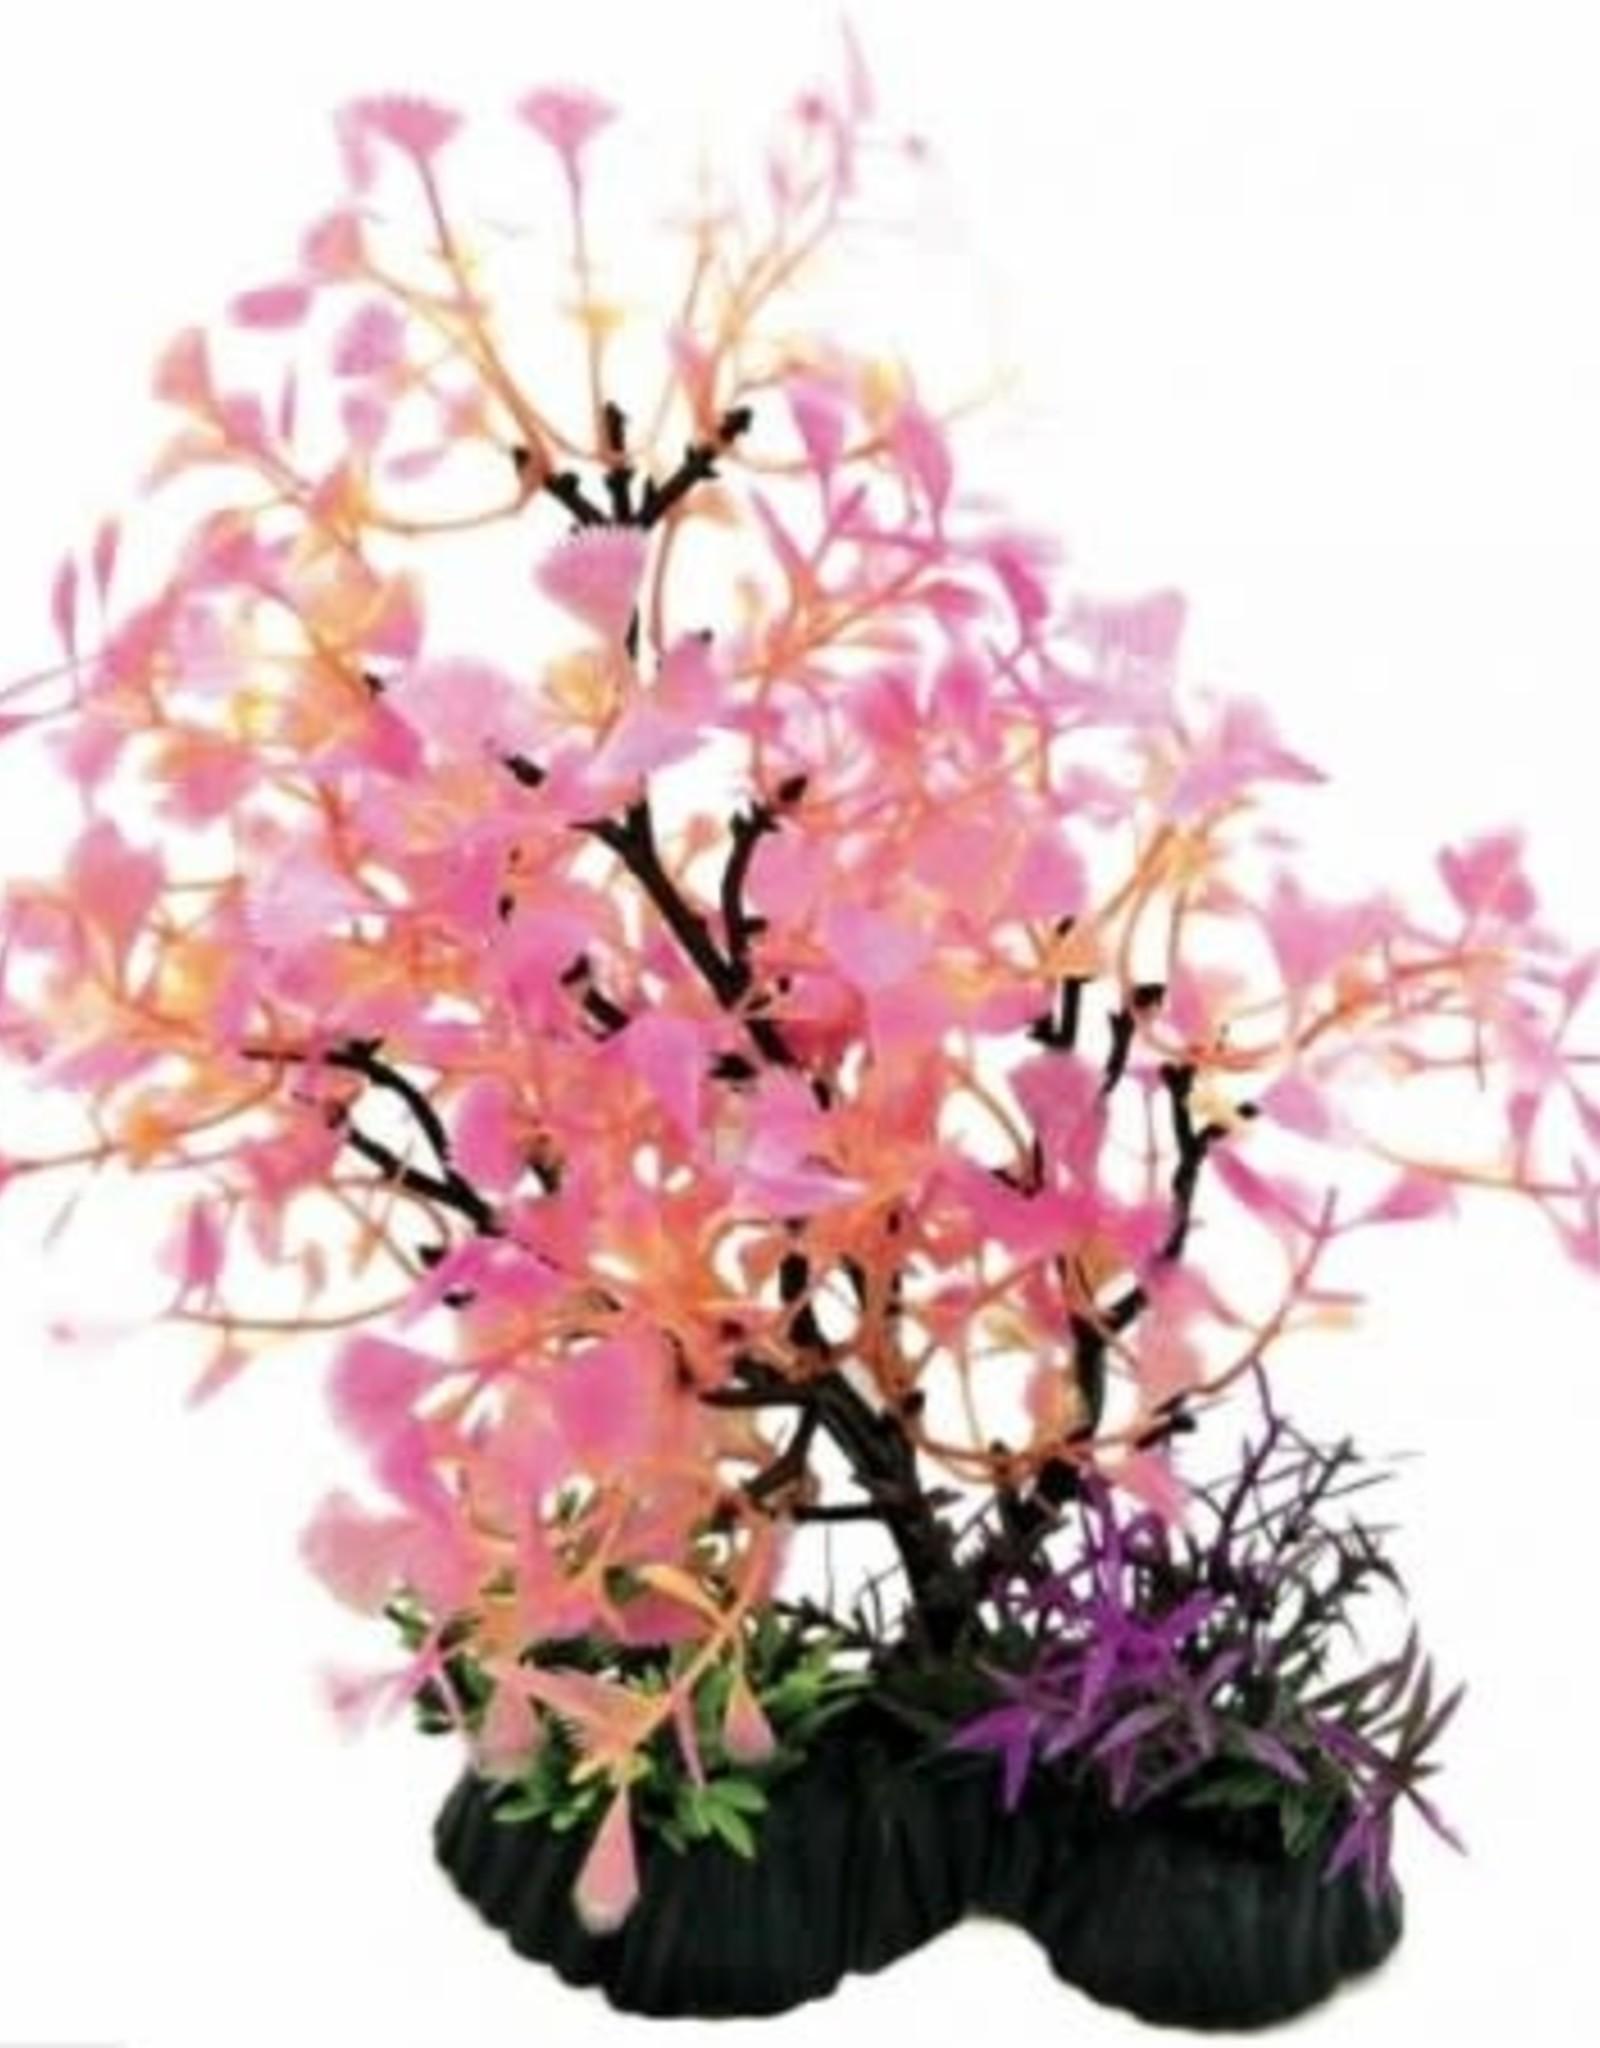 PENN-PLAX INC Bonsai Plant Pink 11-12in